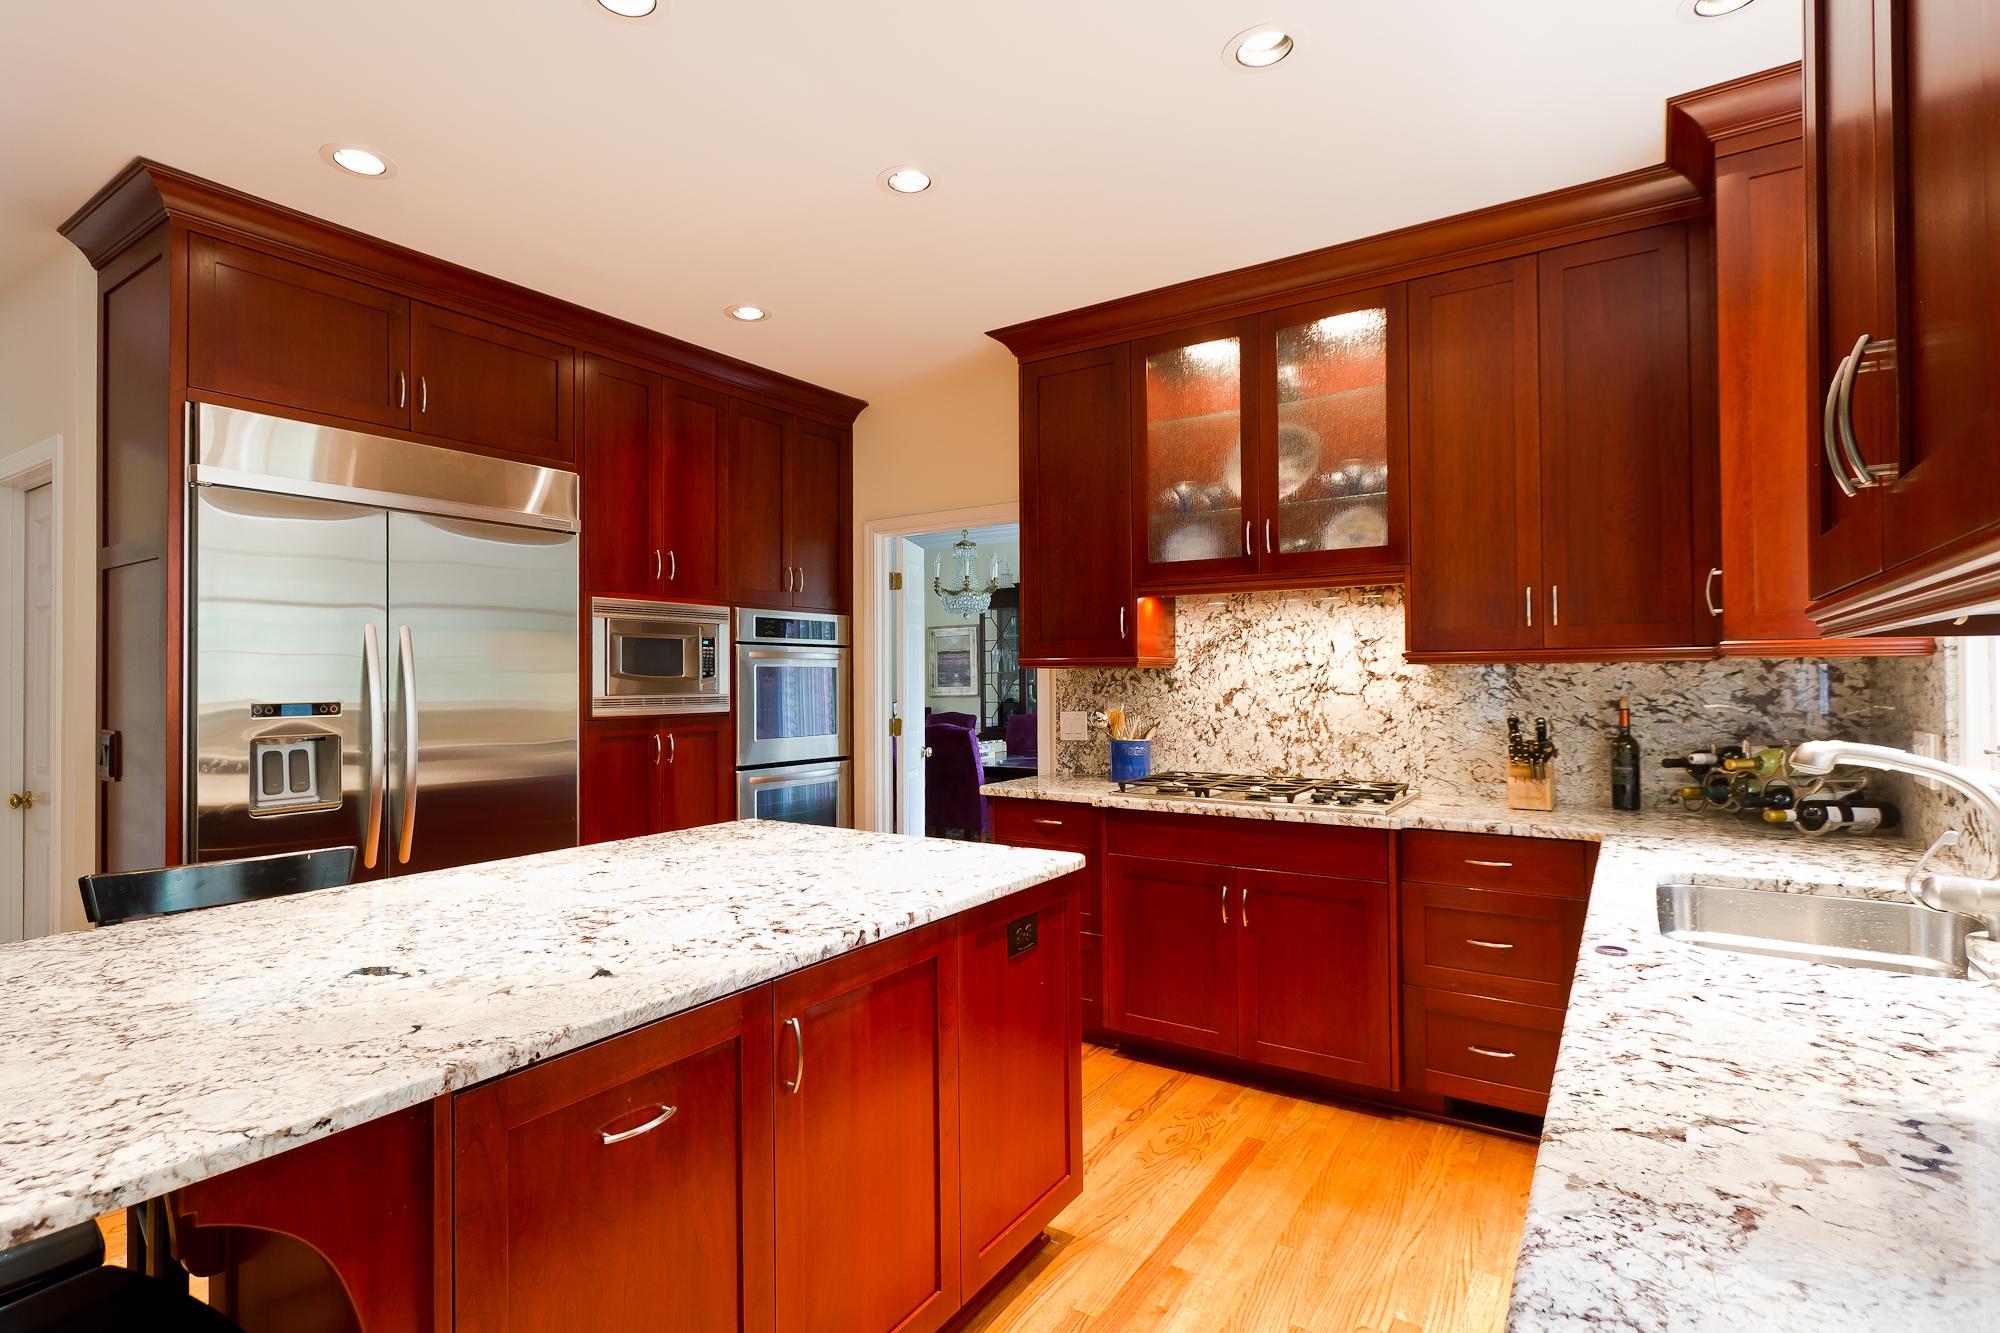 johns creek, ga bath & kitchen remodeling | dwell remodeling